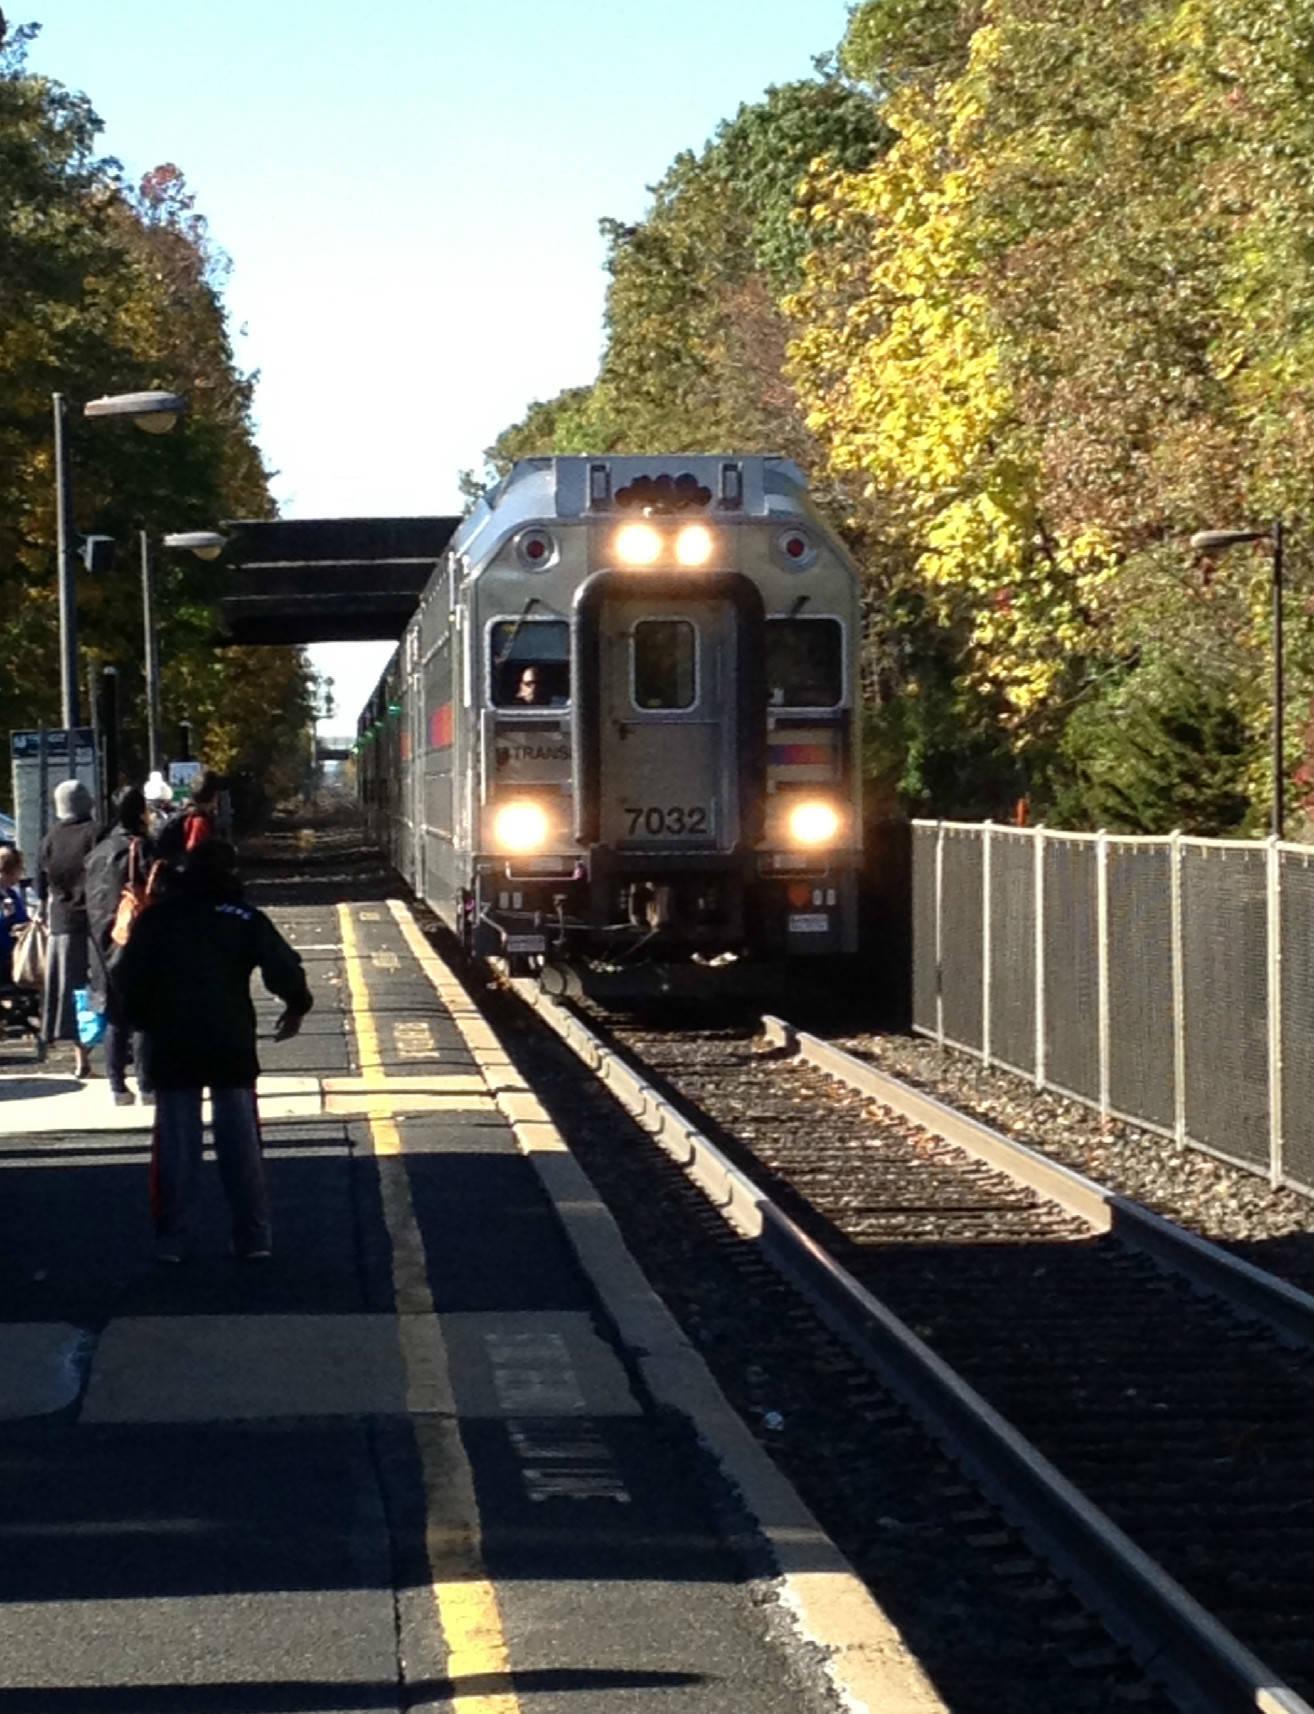 07992671dba5741eabb7_NJT_1016am_train_pulls_into_Fanwood_10-27-14.jpg